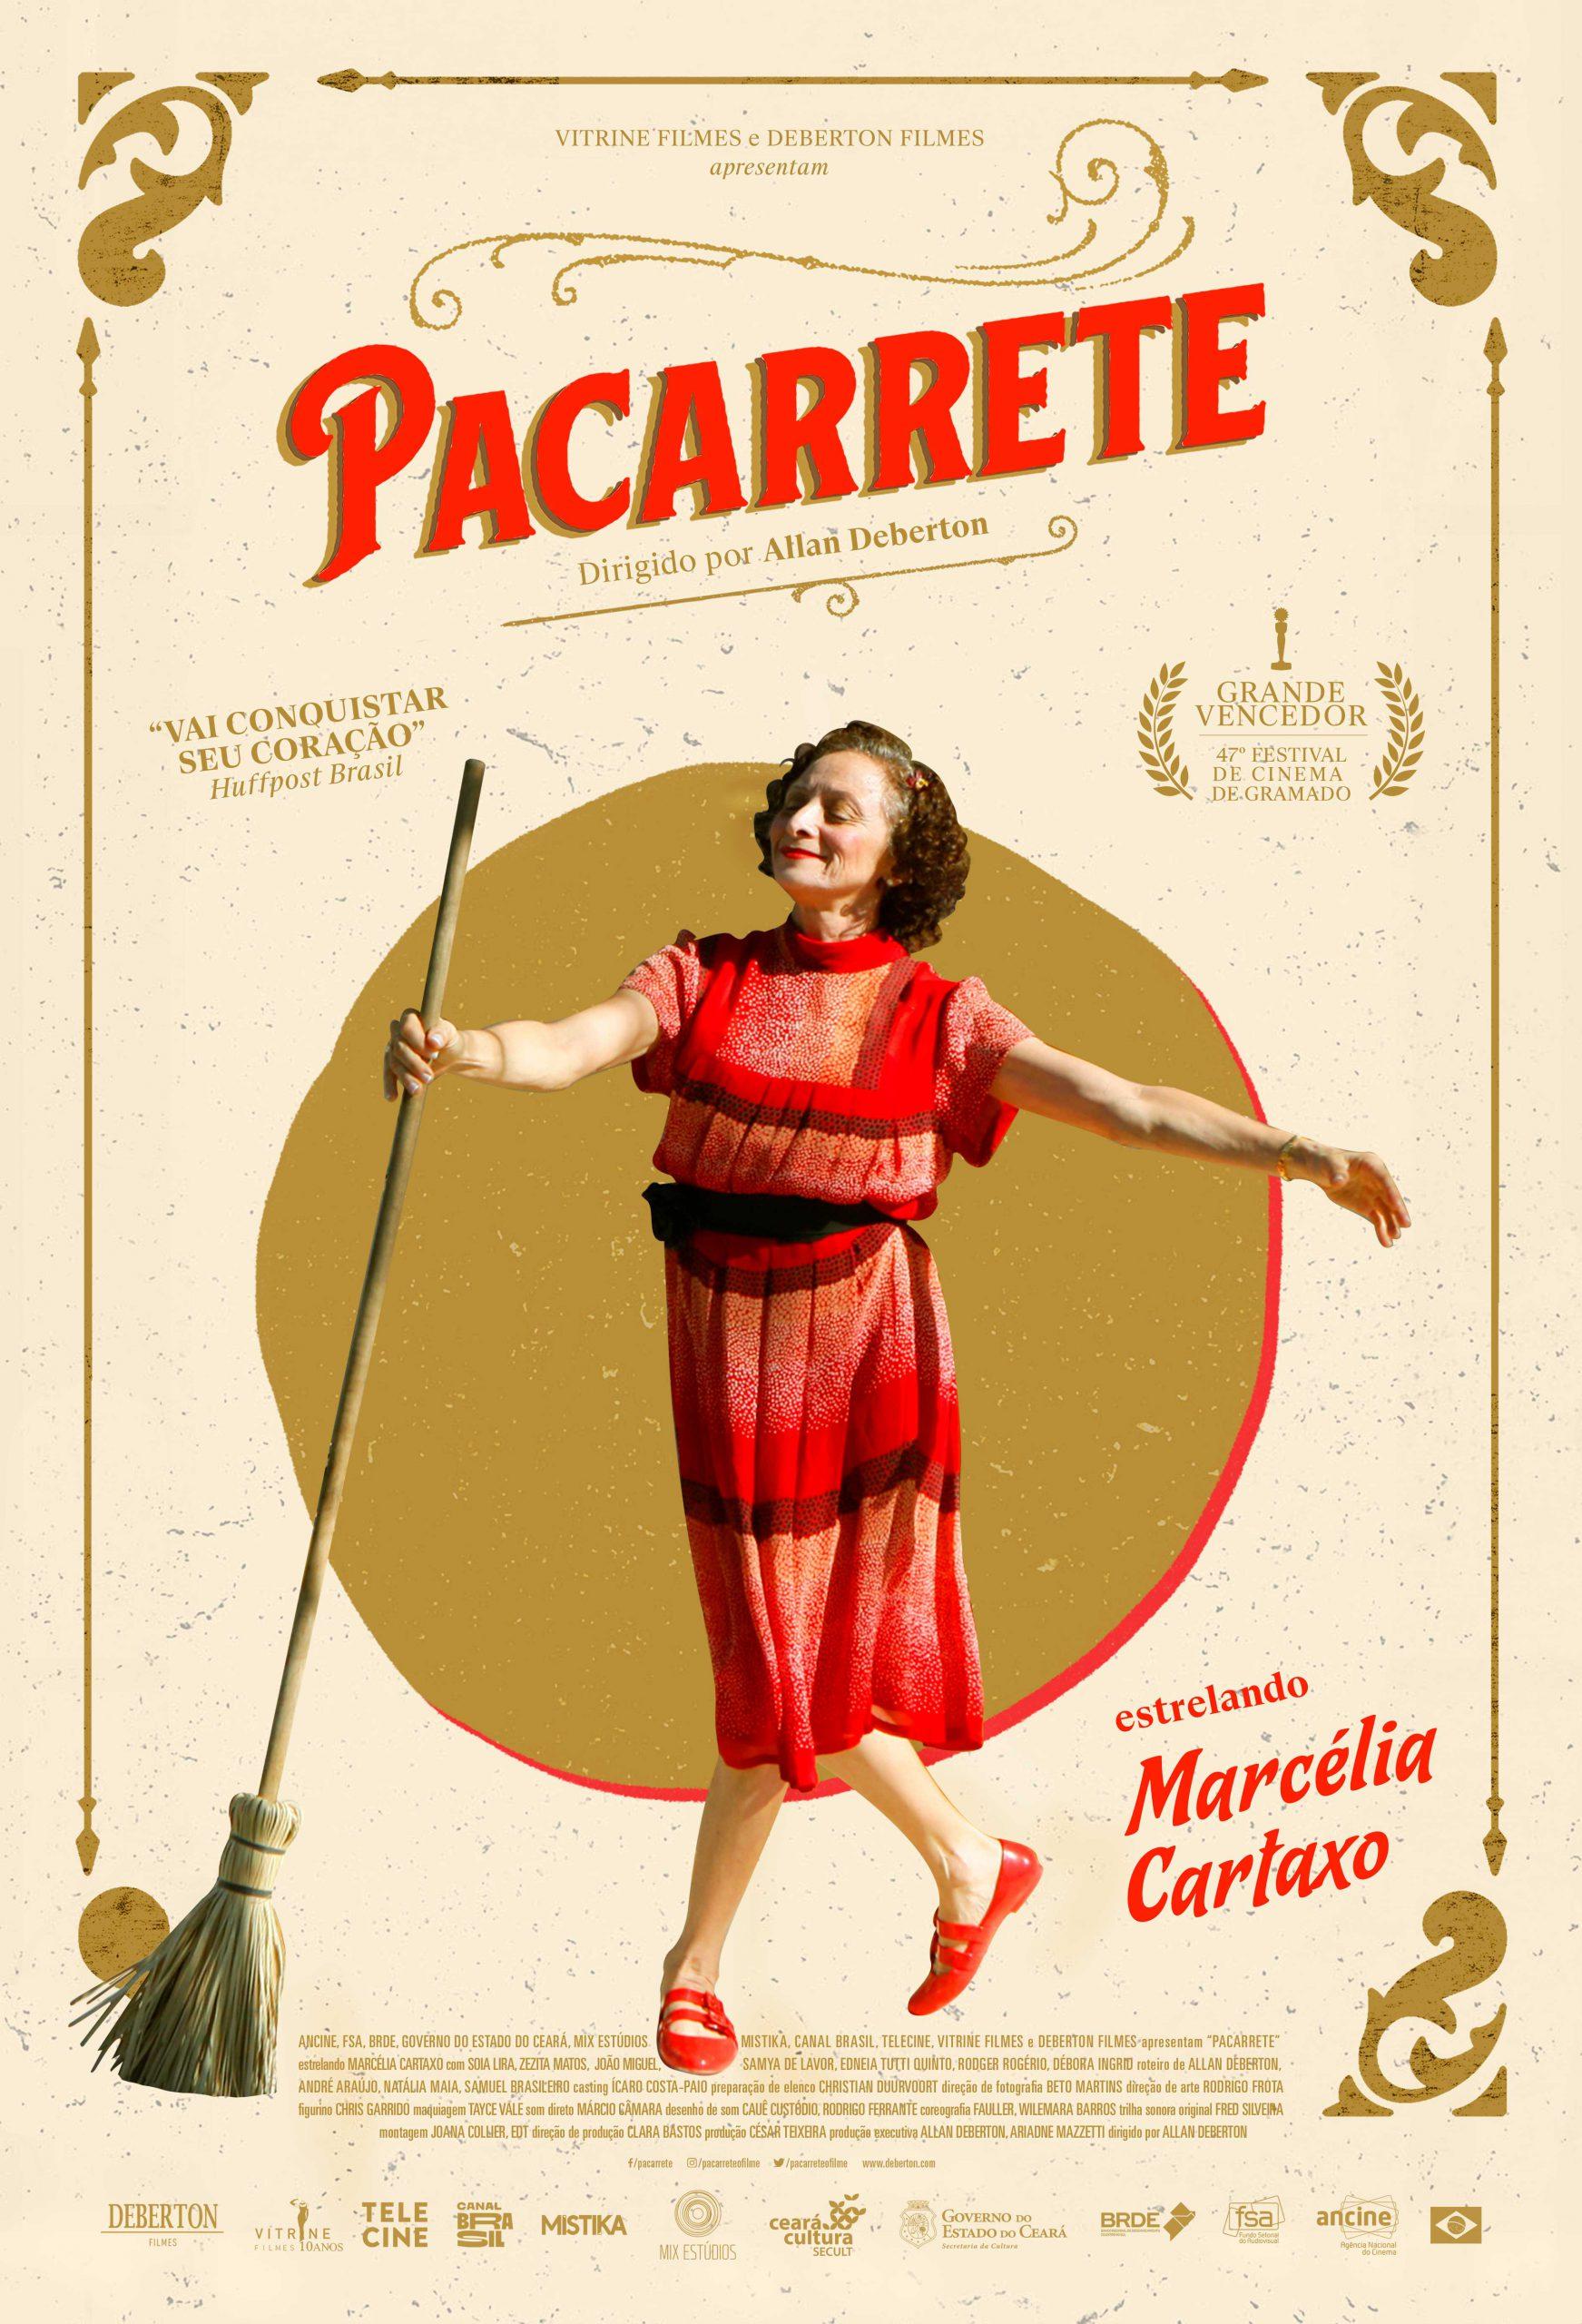 Pacarrete – Vitrine Filmes